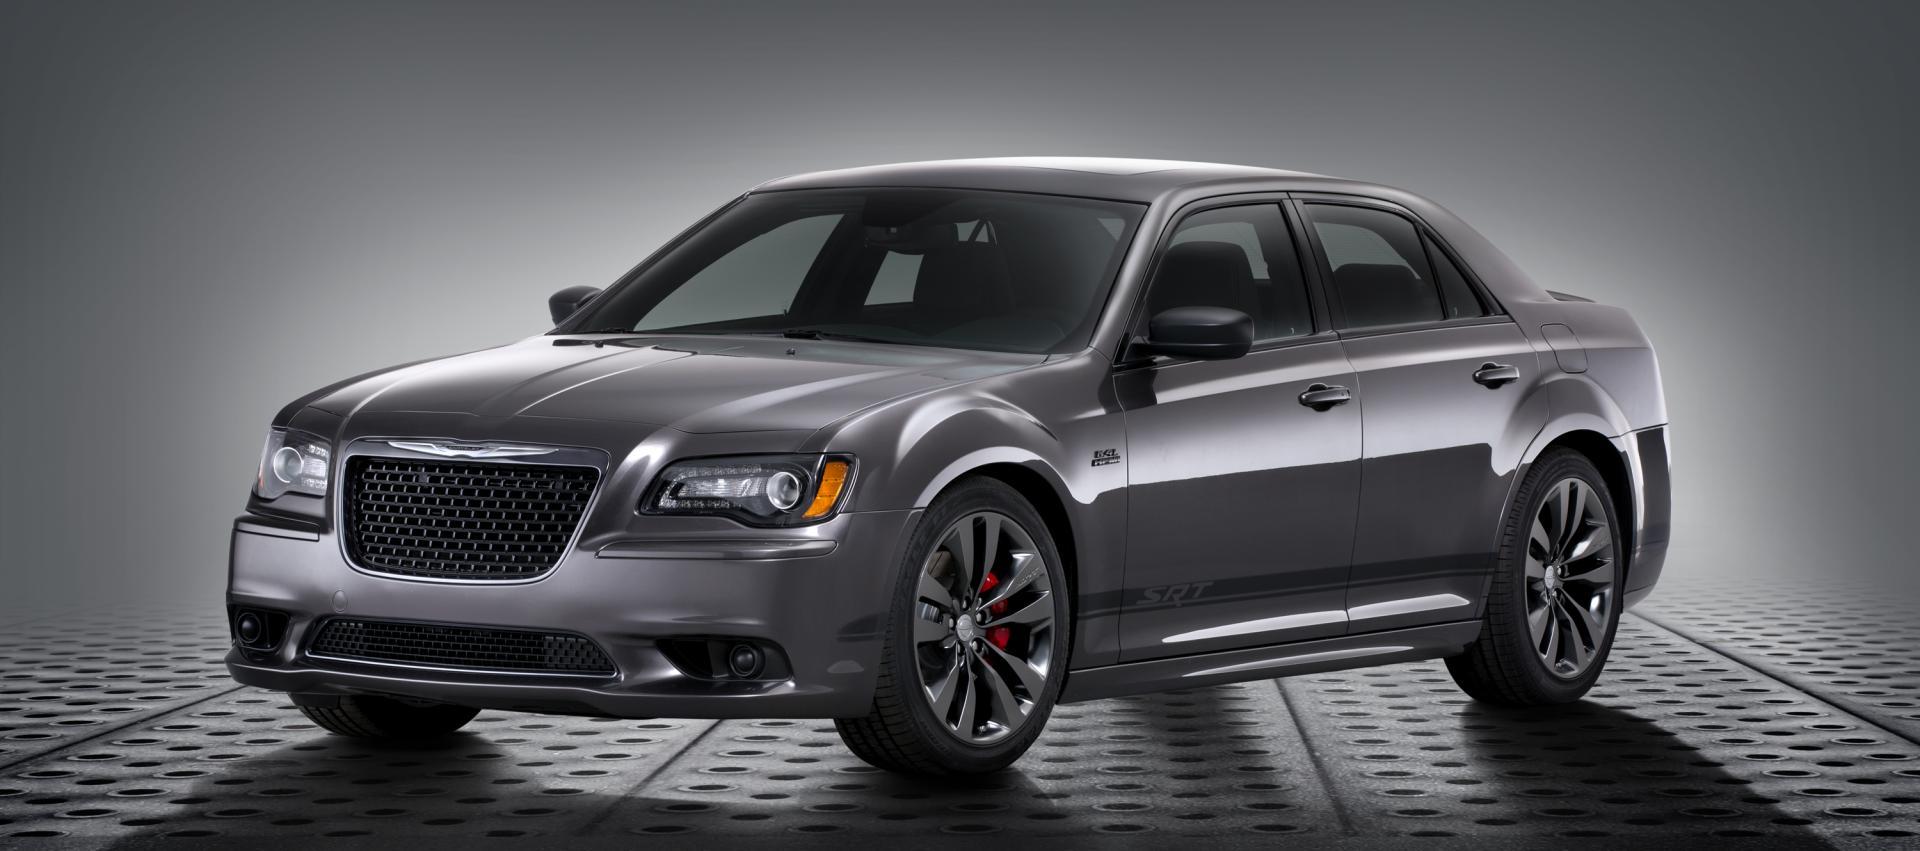 2014 Chrysler 300 Srt Satin Vapor Edition Conceptcarz Com